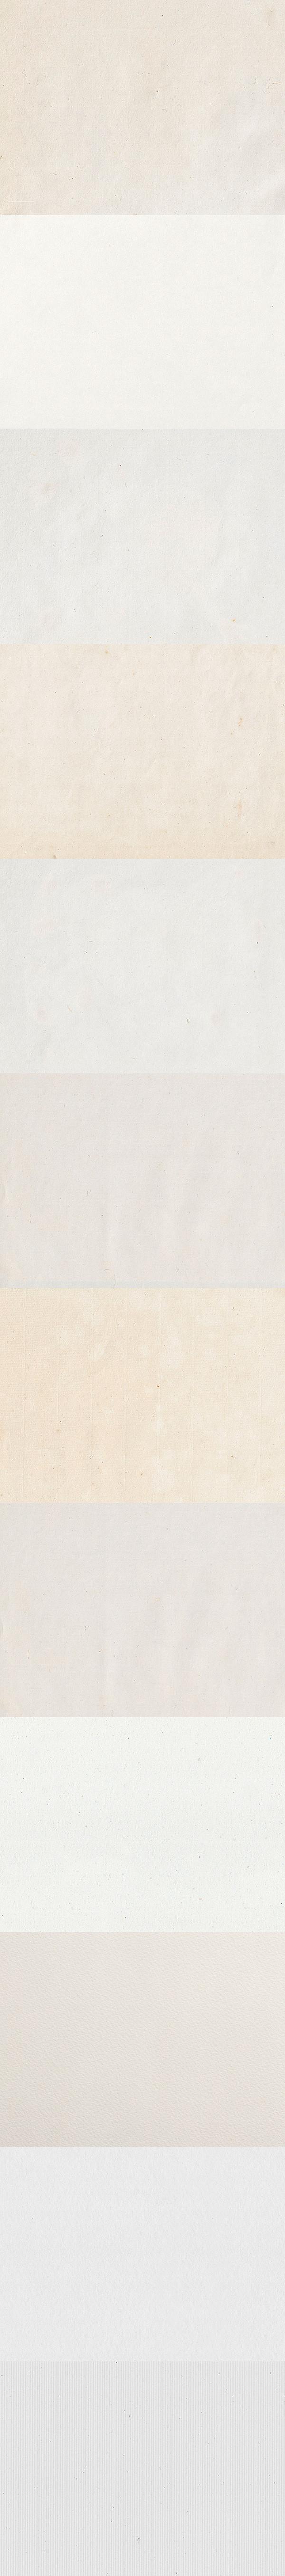 Watercolor paper texture photo